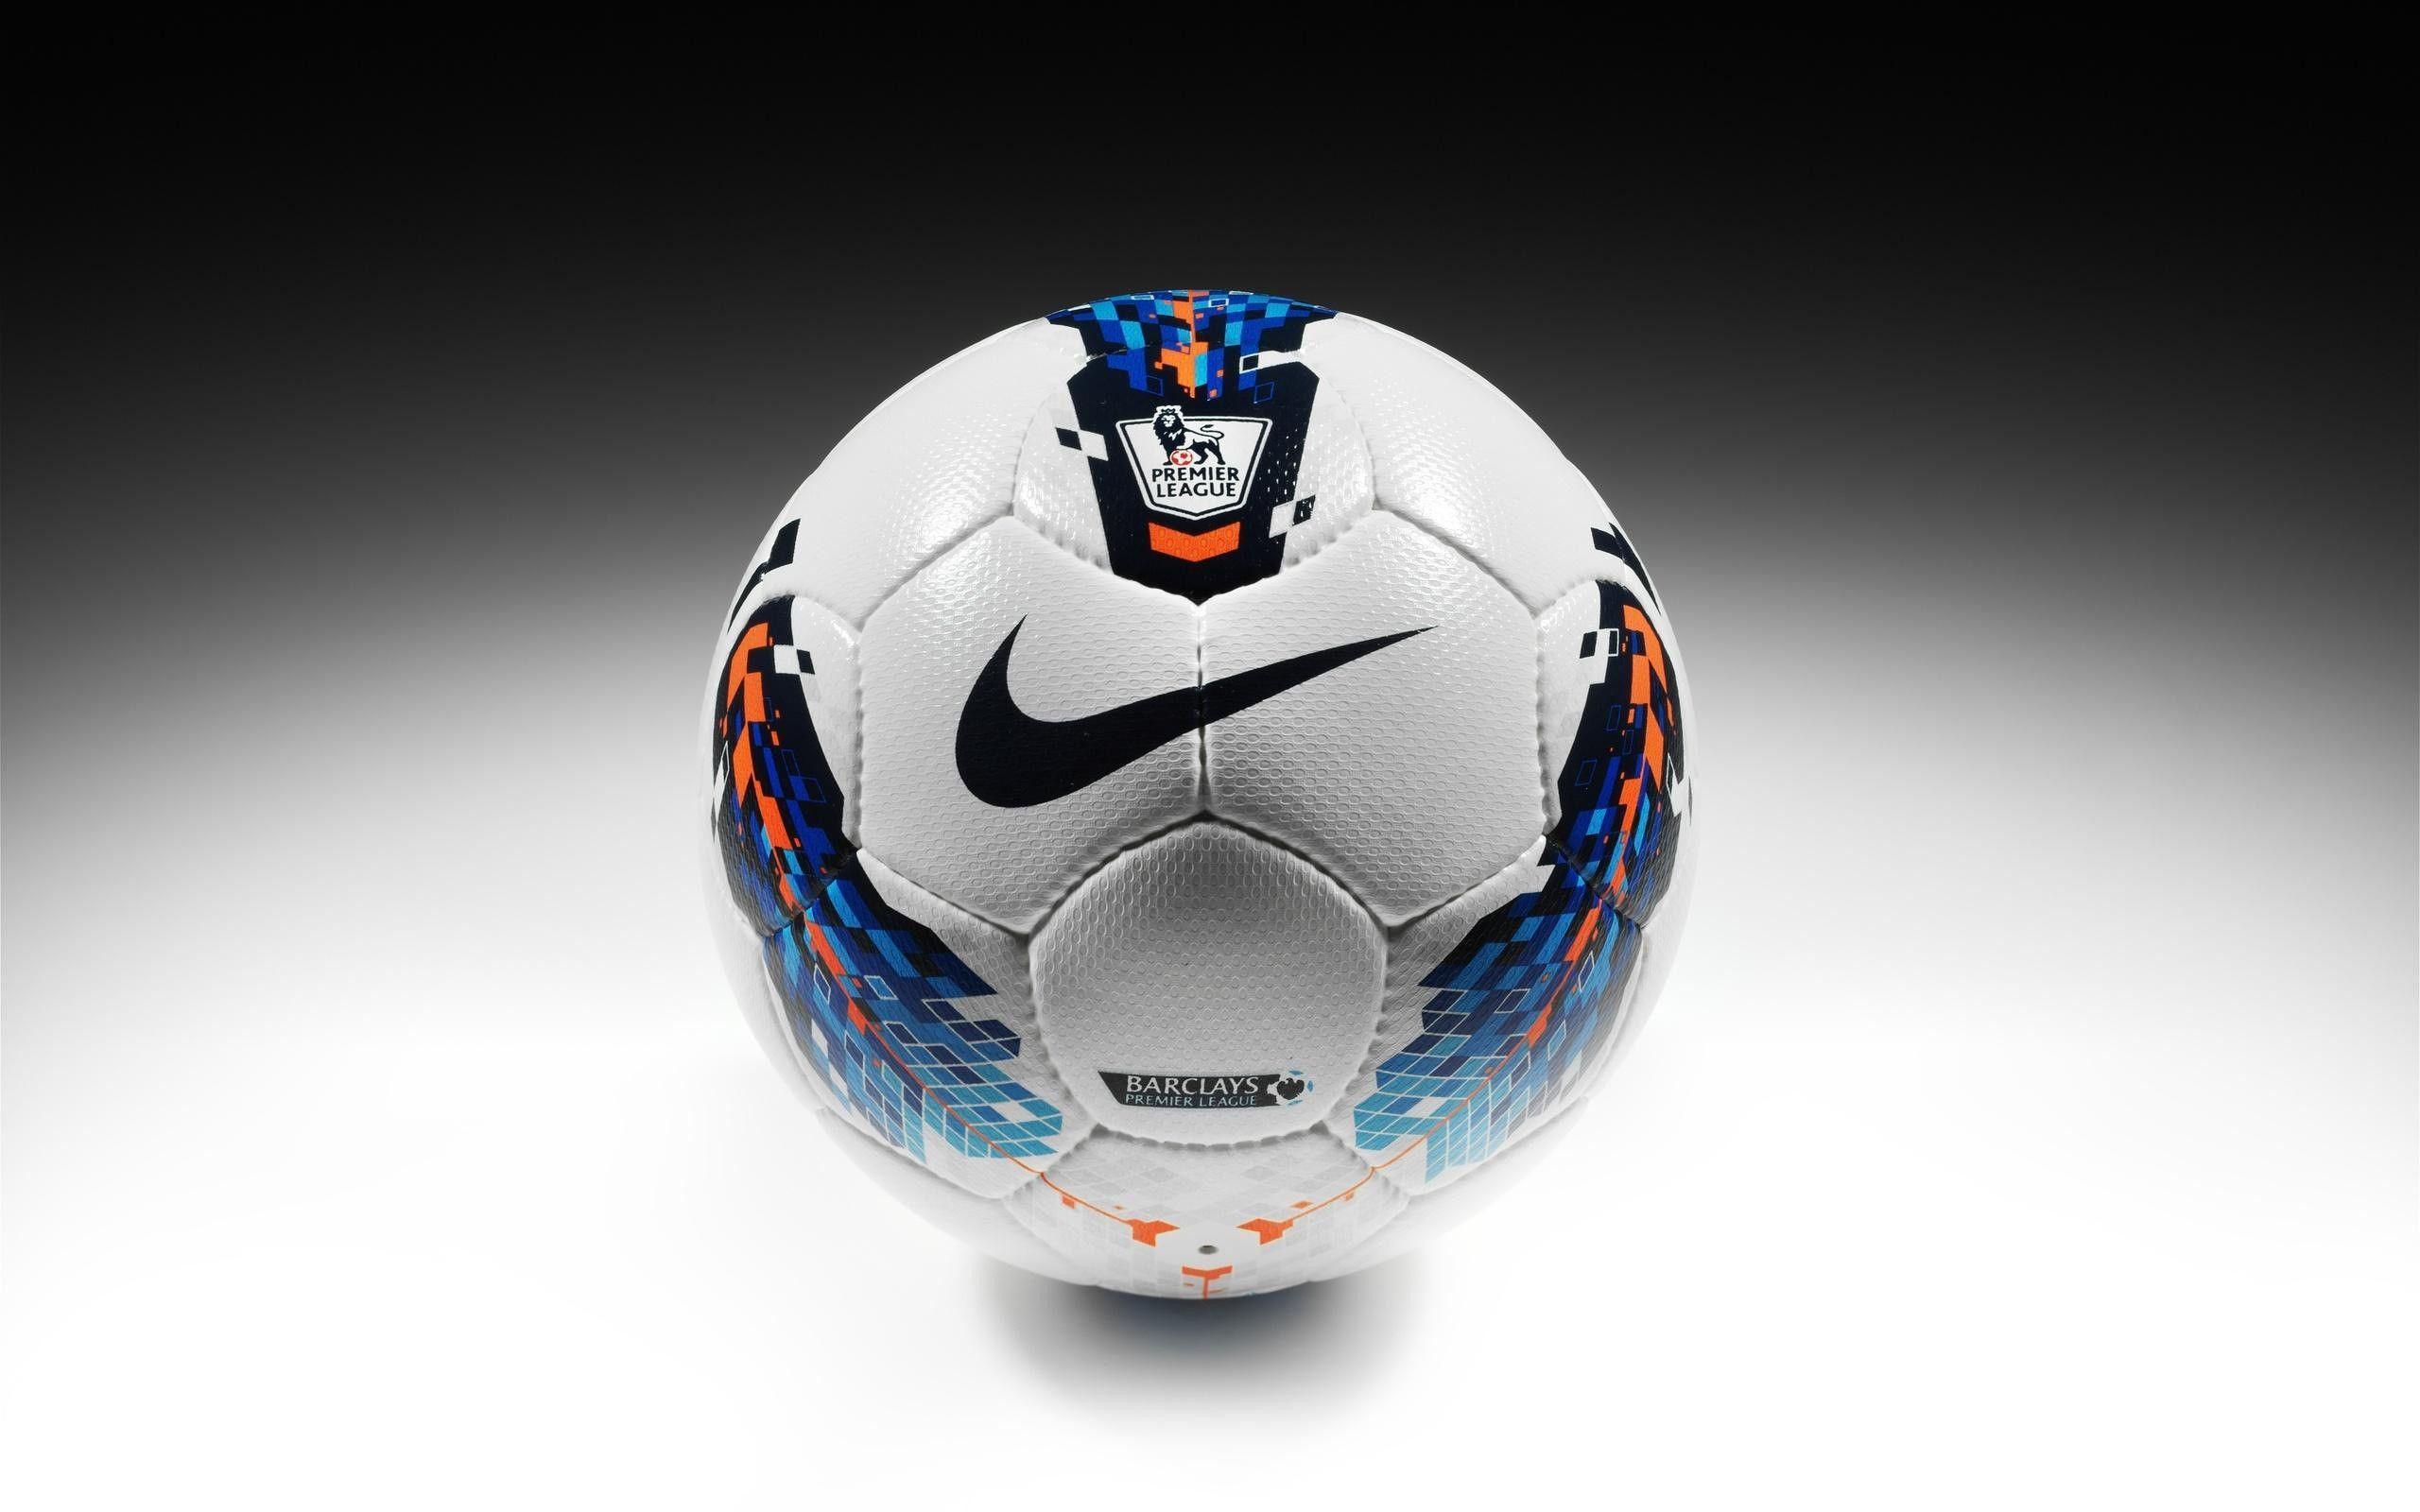 Nike Football Hd Wallpapers Wallpaper Cave